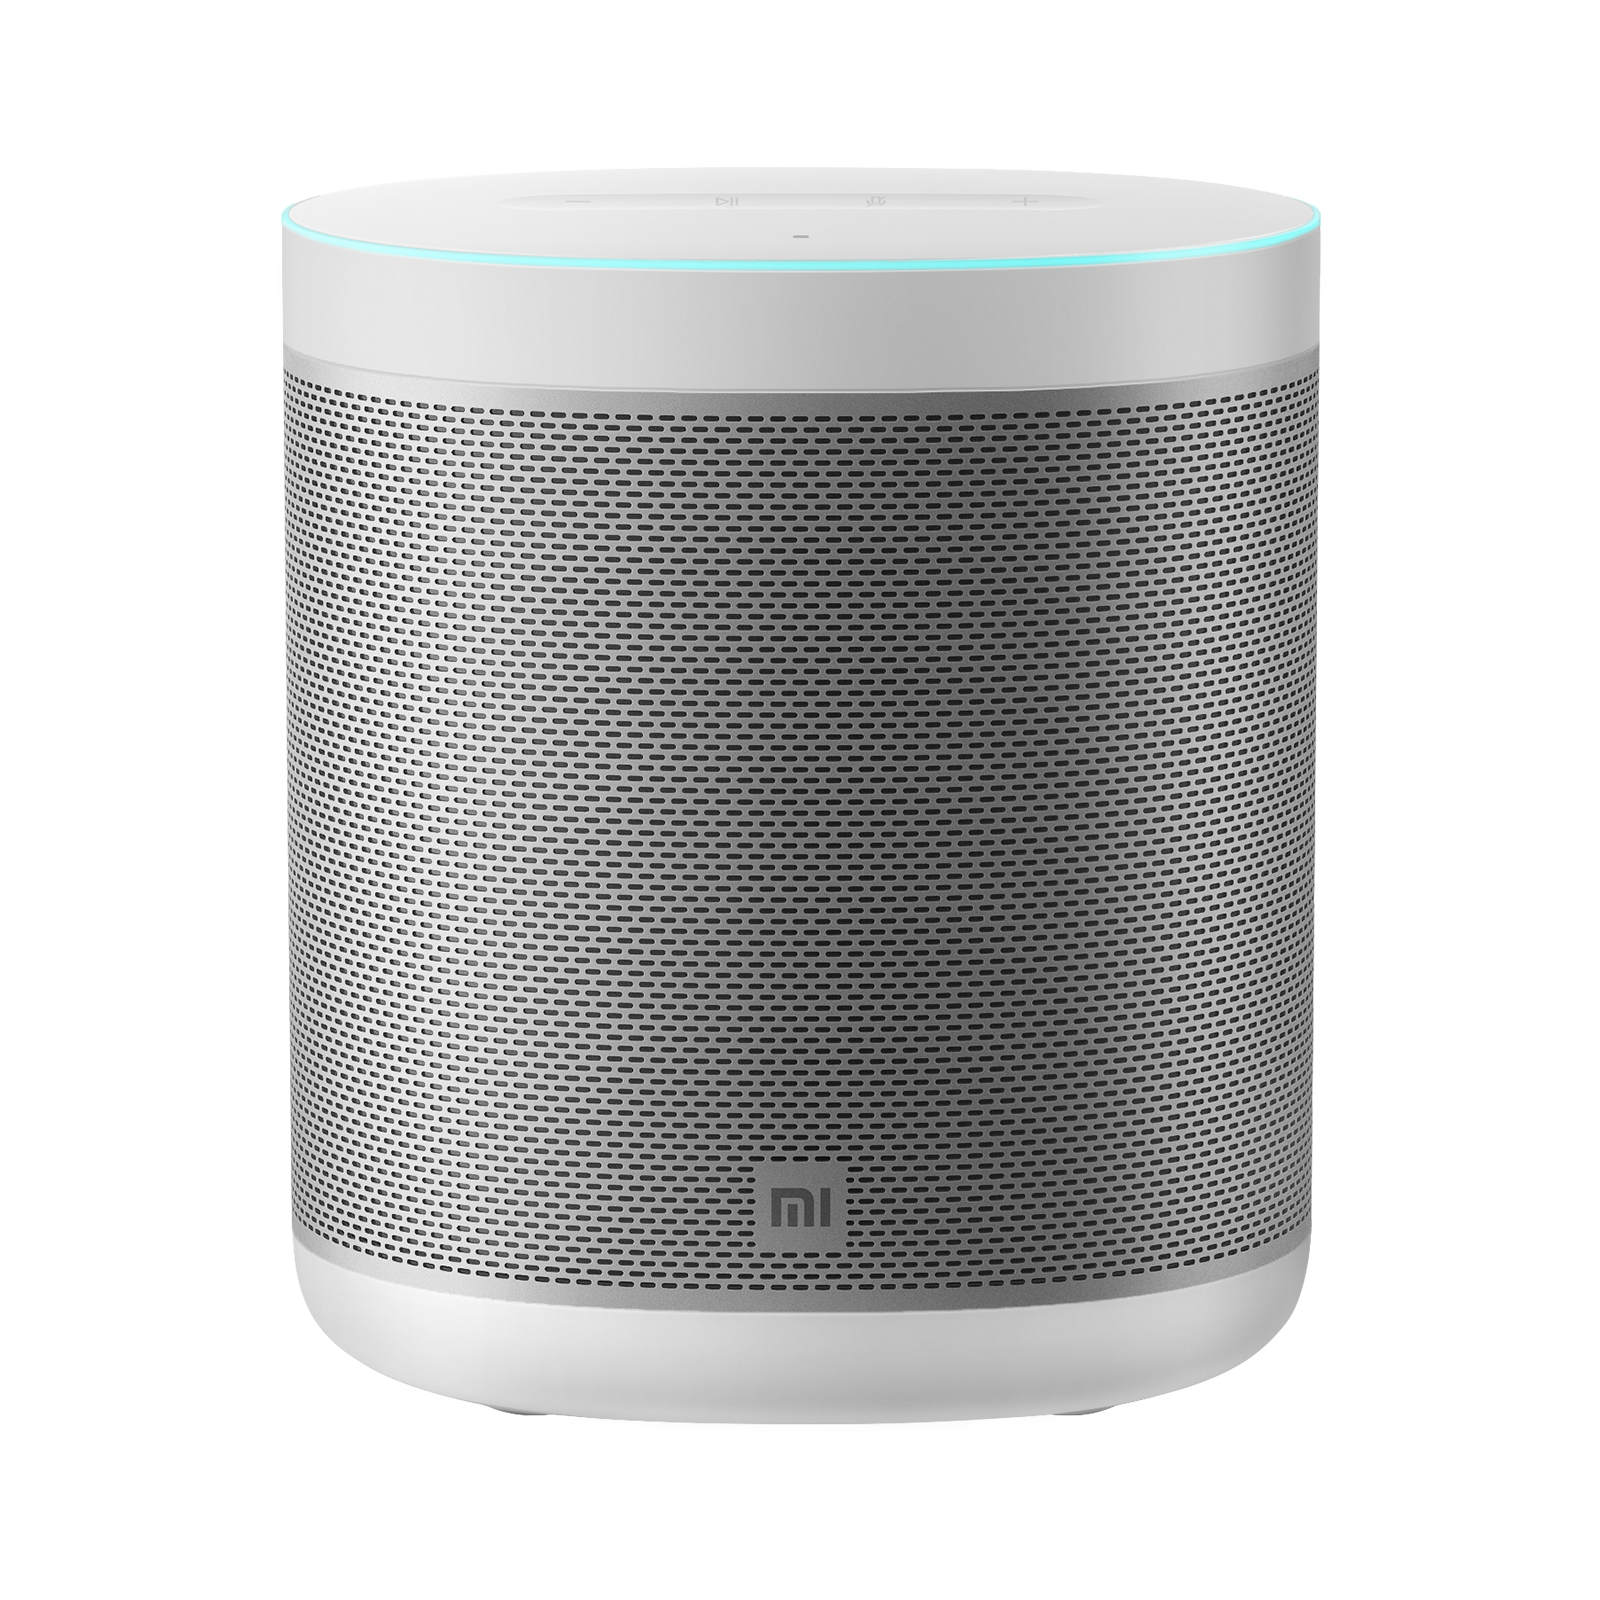 Mi Smart Speaker Blanco